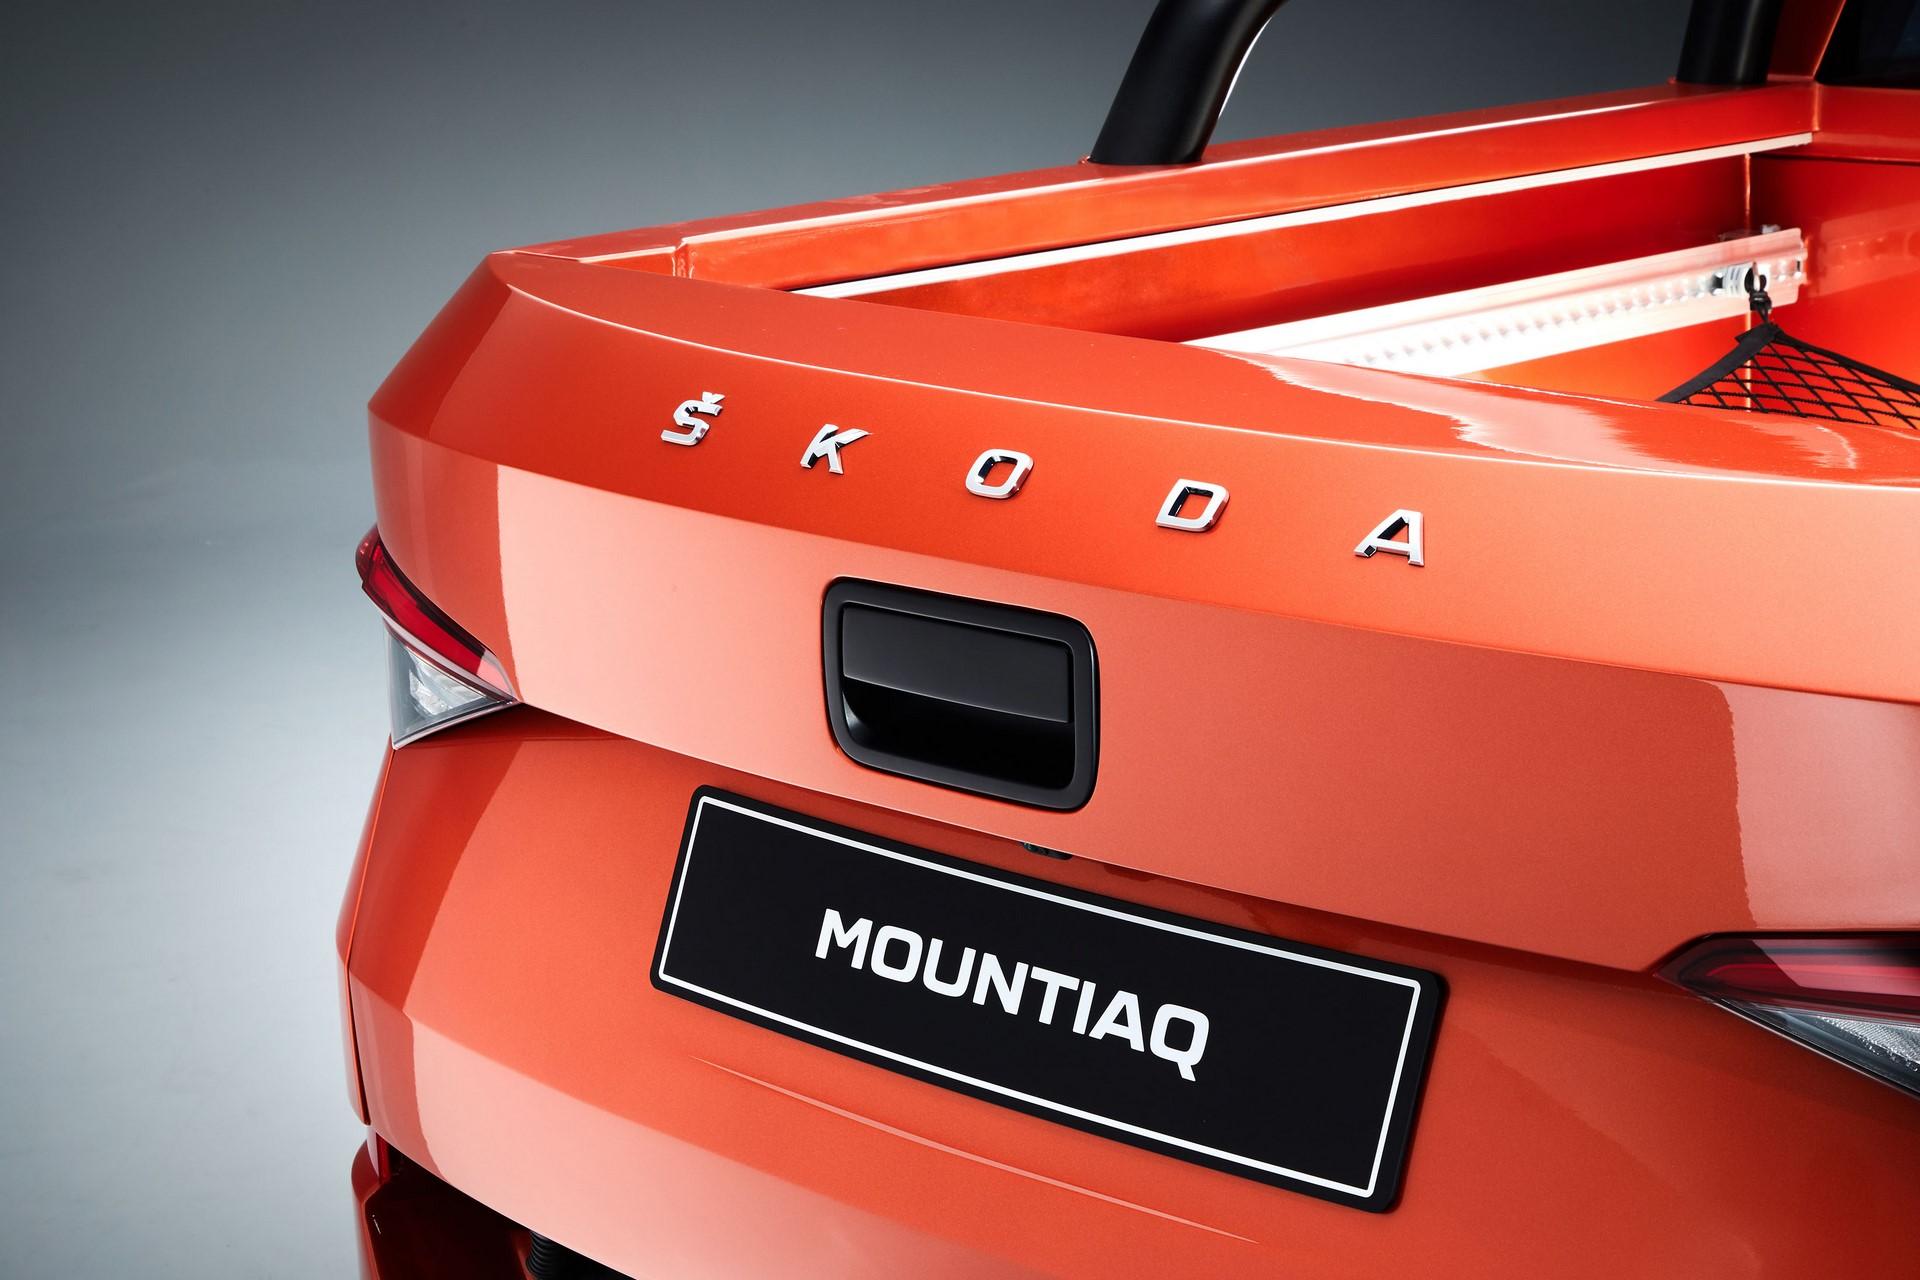 Skoda-Mountiaq-21